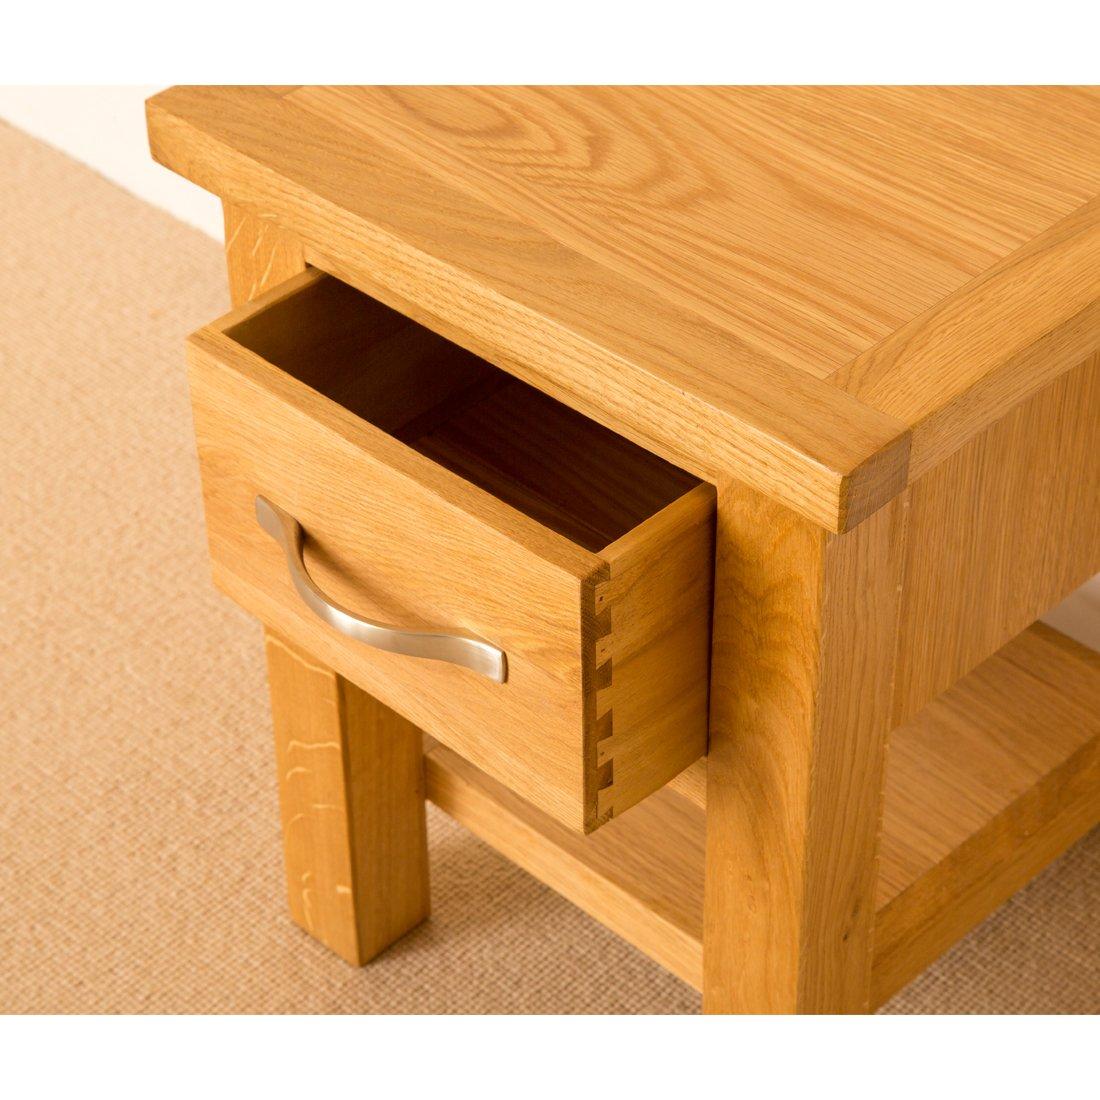 Oak lamp tables image collections coffee table design ideas newlyn oak side table light oak lamp table with drawer solid newlyn oak side table light geotapseo Gallery